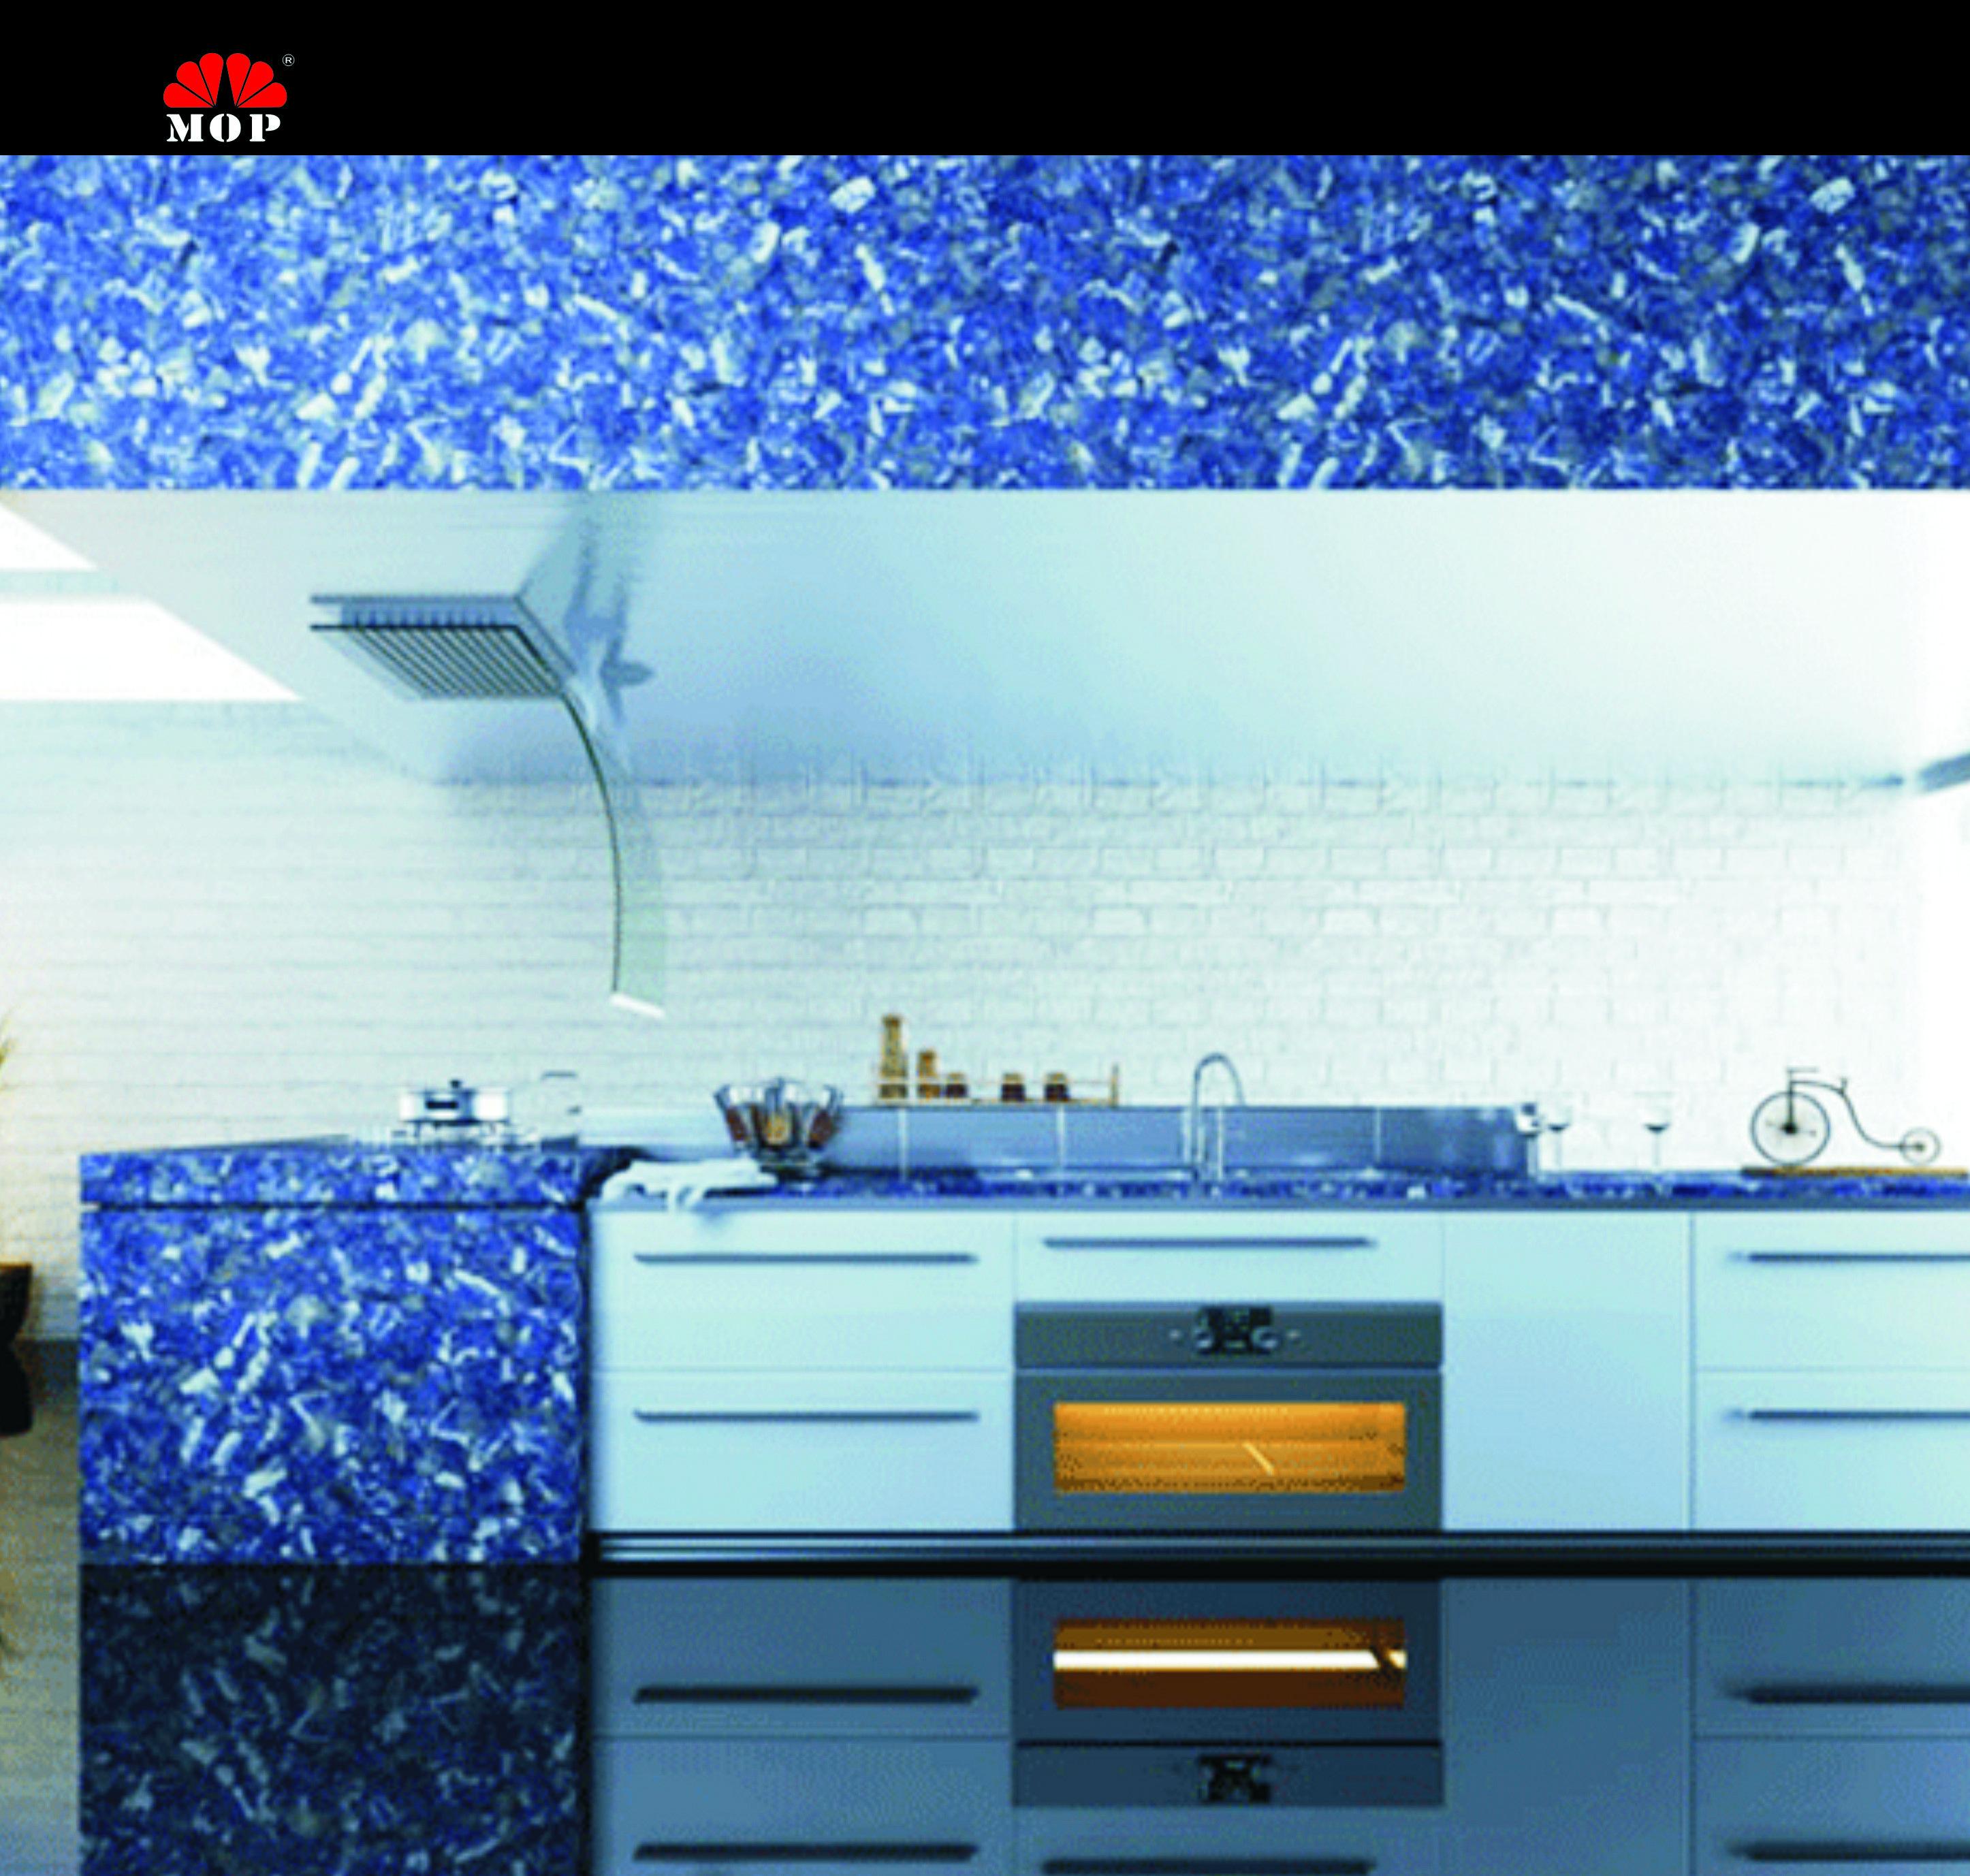 blue veins stone kitchen decoration slabblue like the sky home decorate backsplash - Stone Slab Kitchen Decor